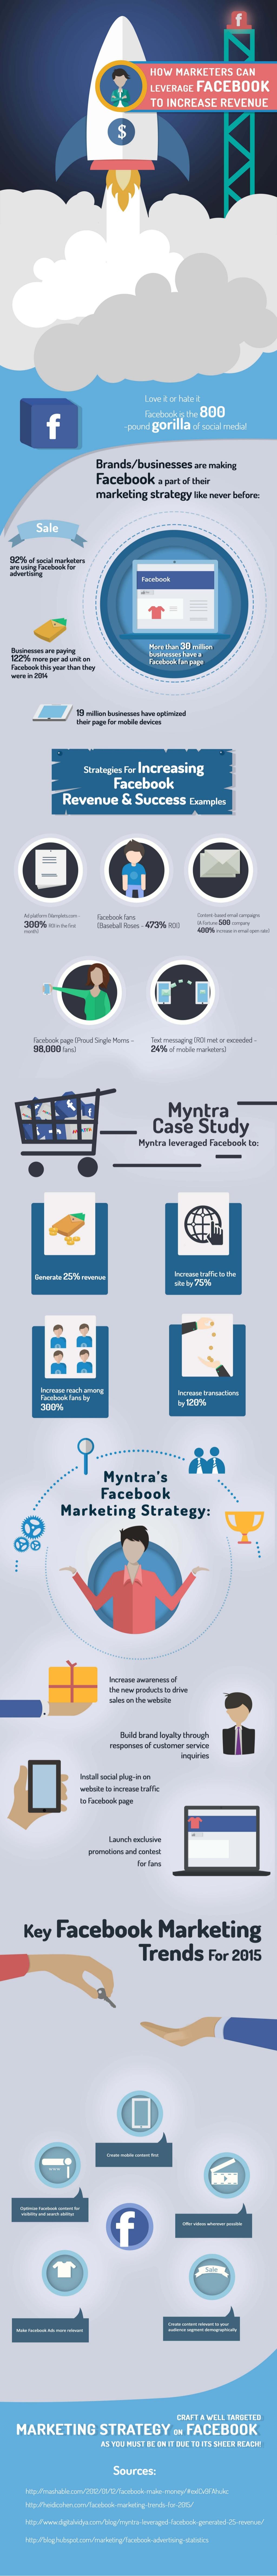 Facebook para Marketing #infografia #socialmedia #socialmedia